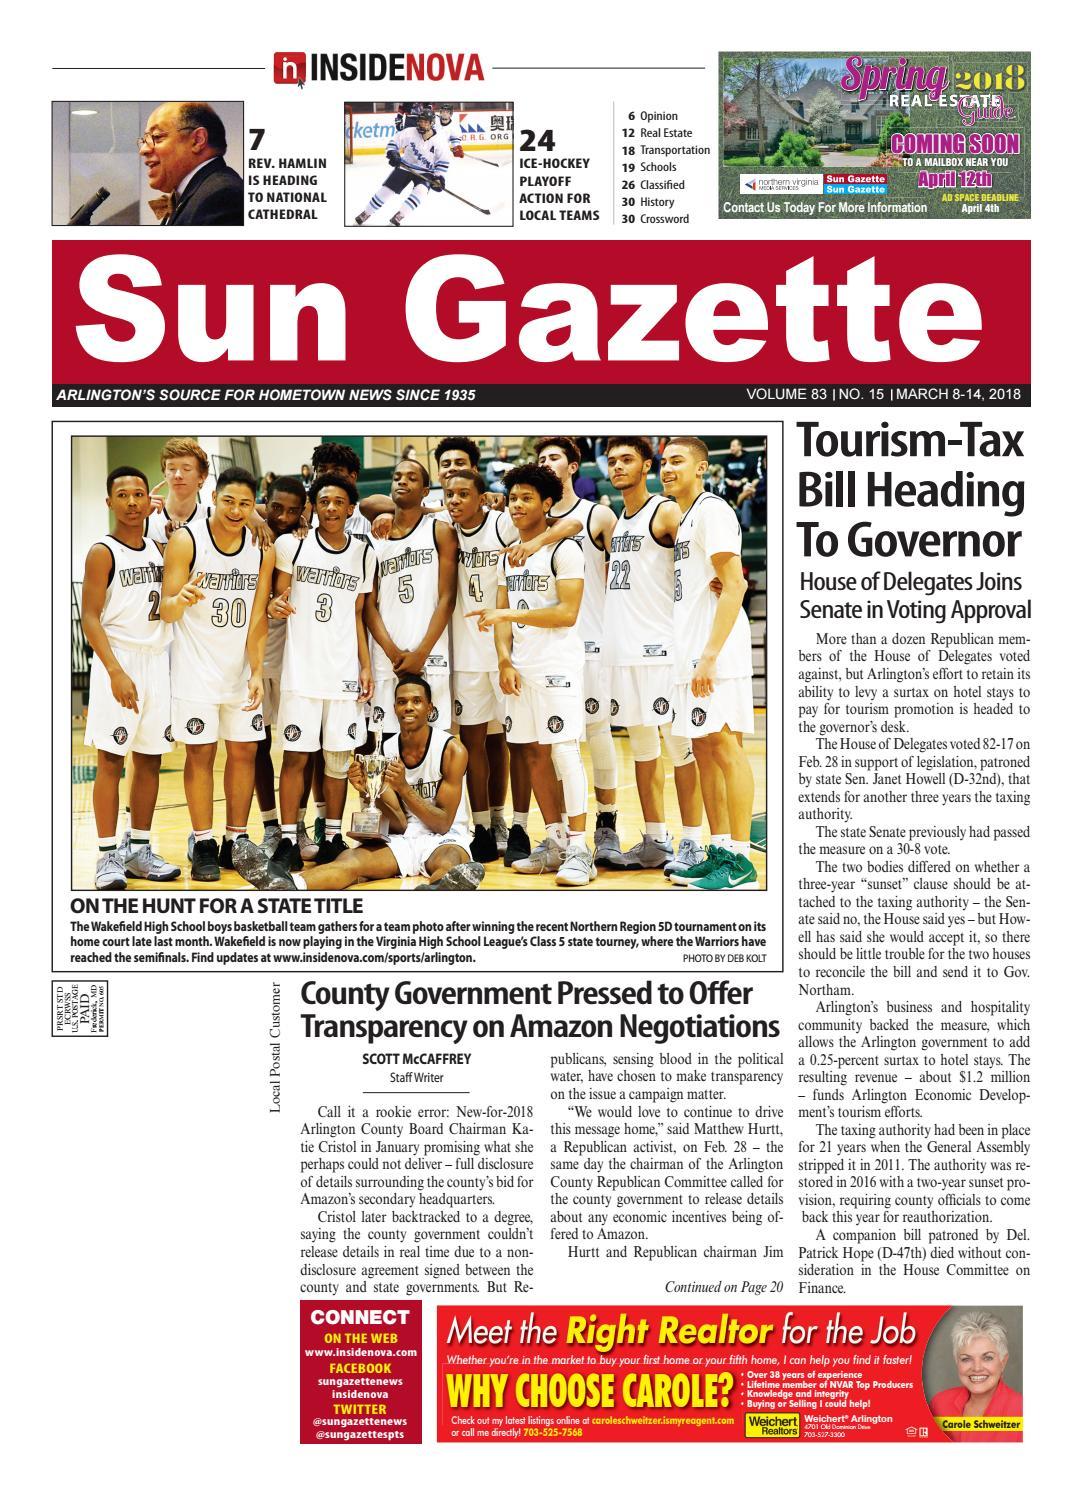 Sun Gazette Arlington, March 8, 2018 by InsideNoVa - issuu